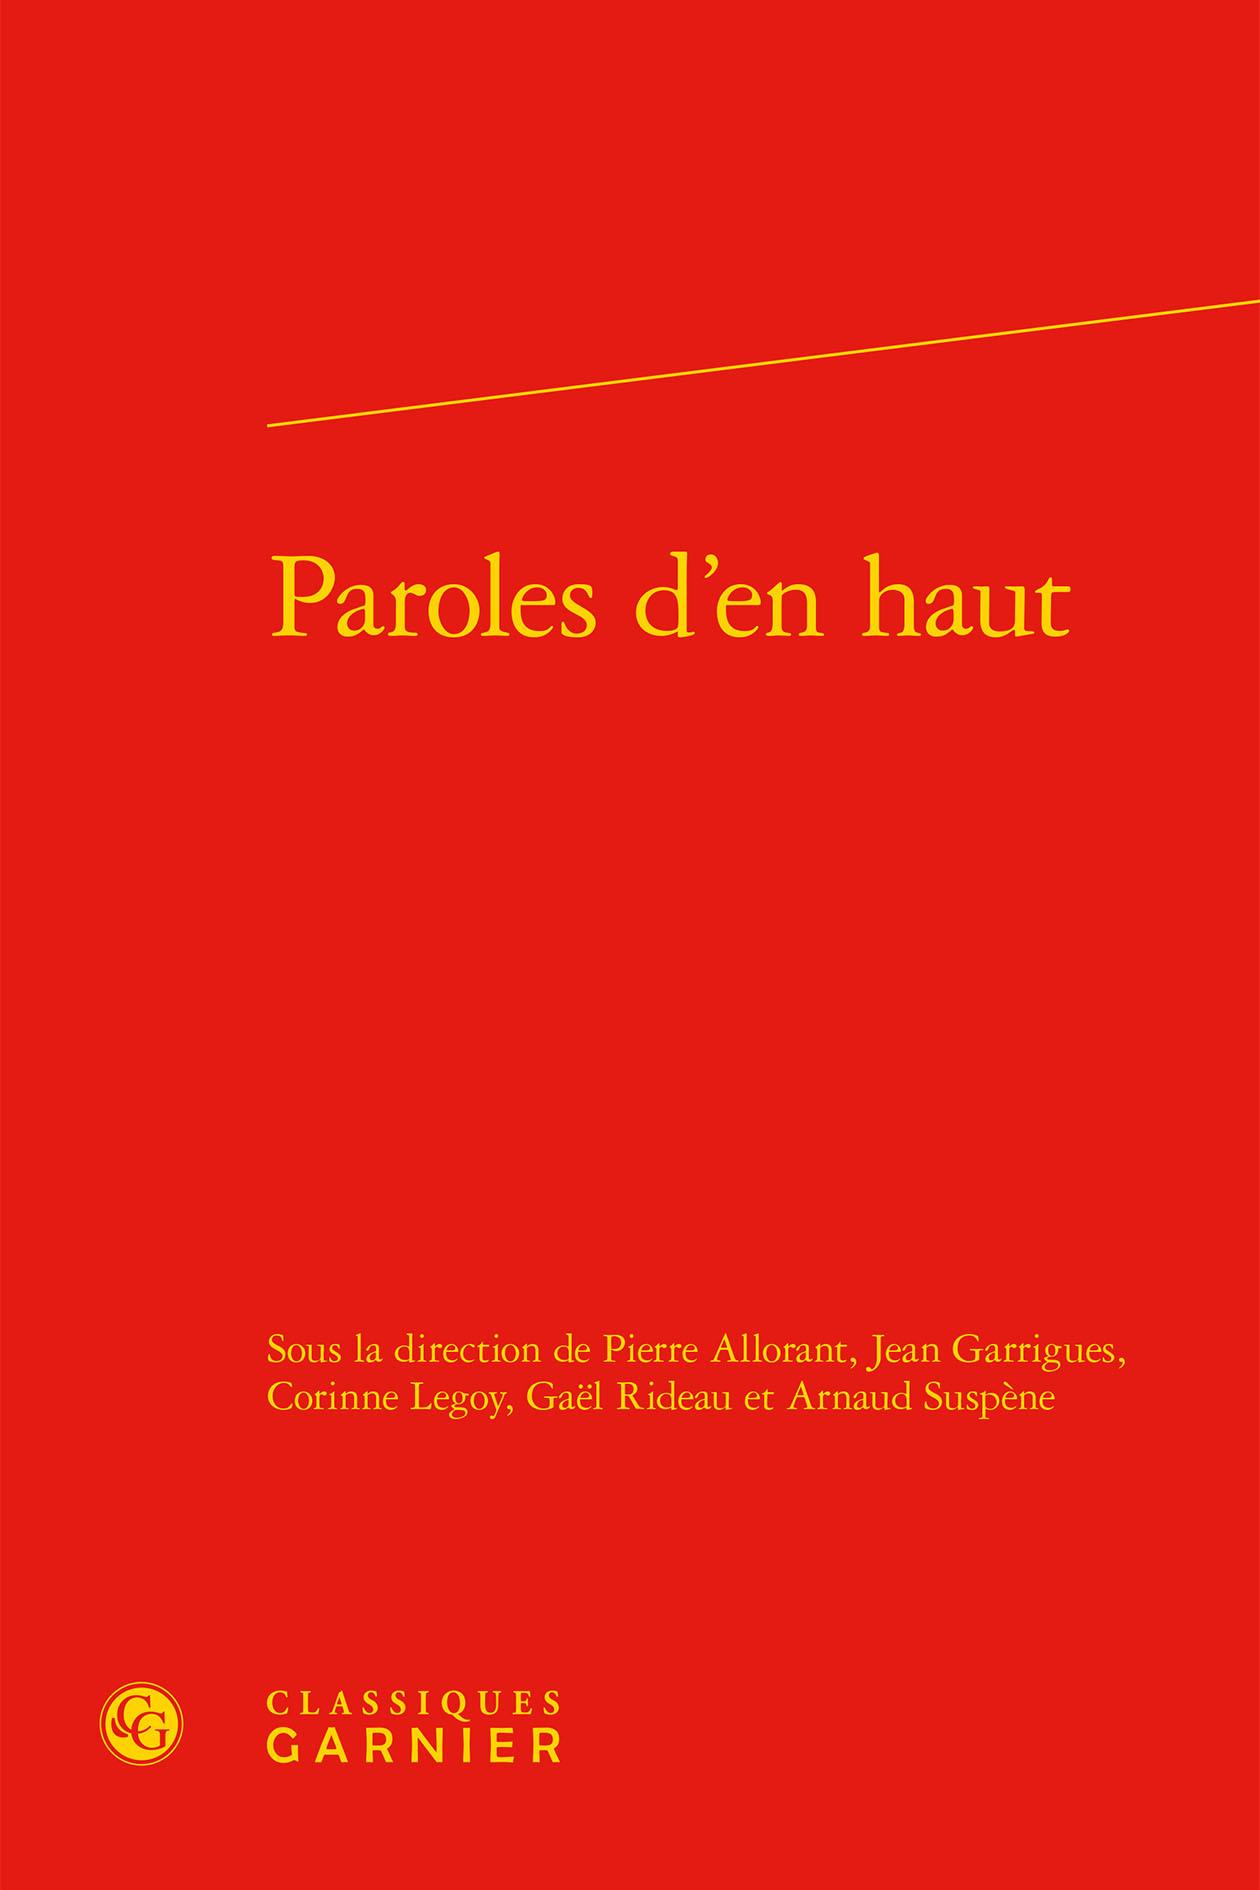 PAROLES D'EN HAUT